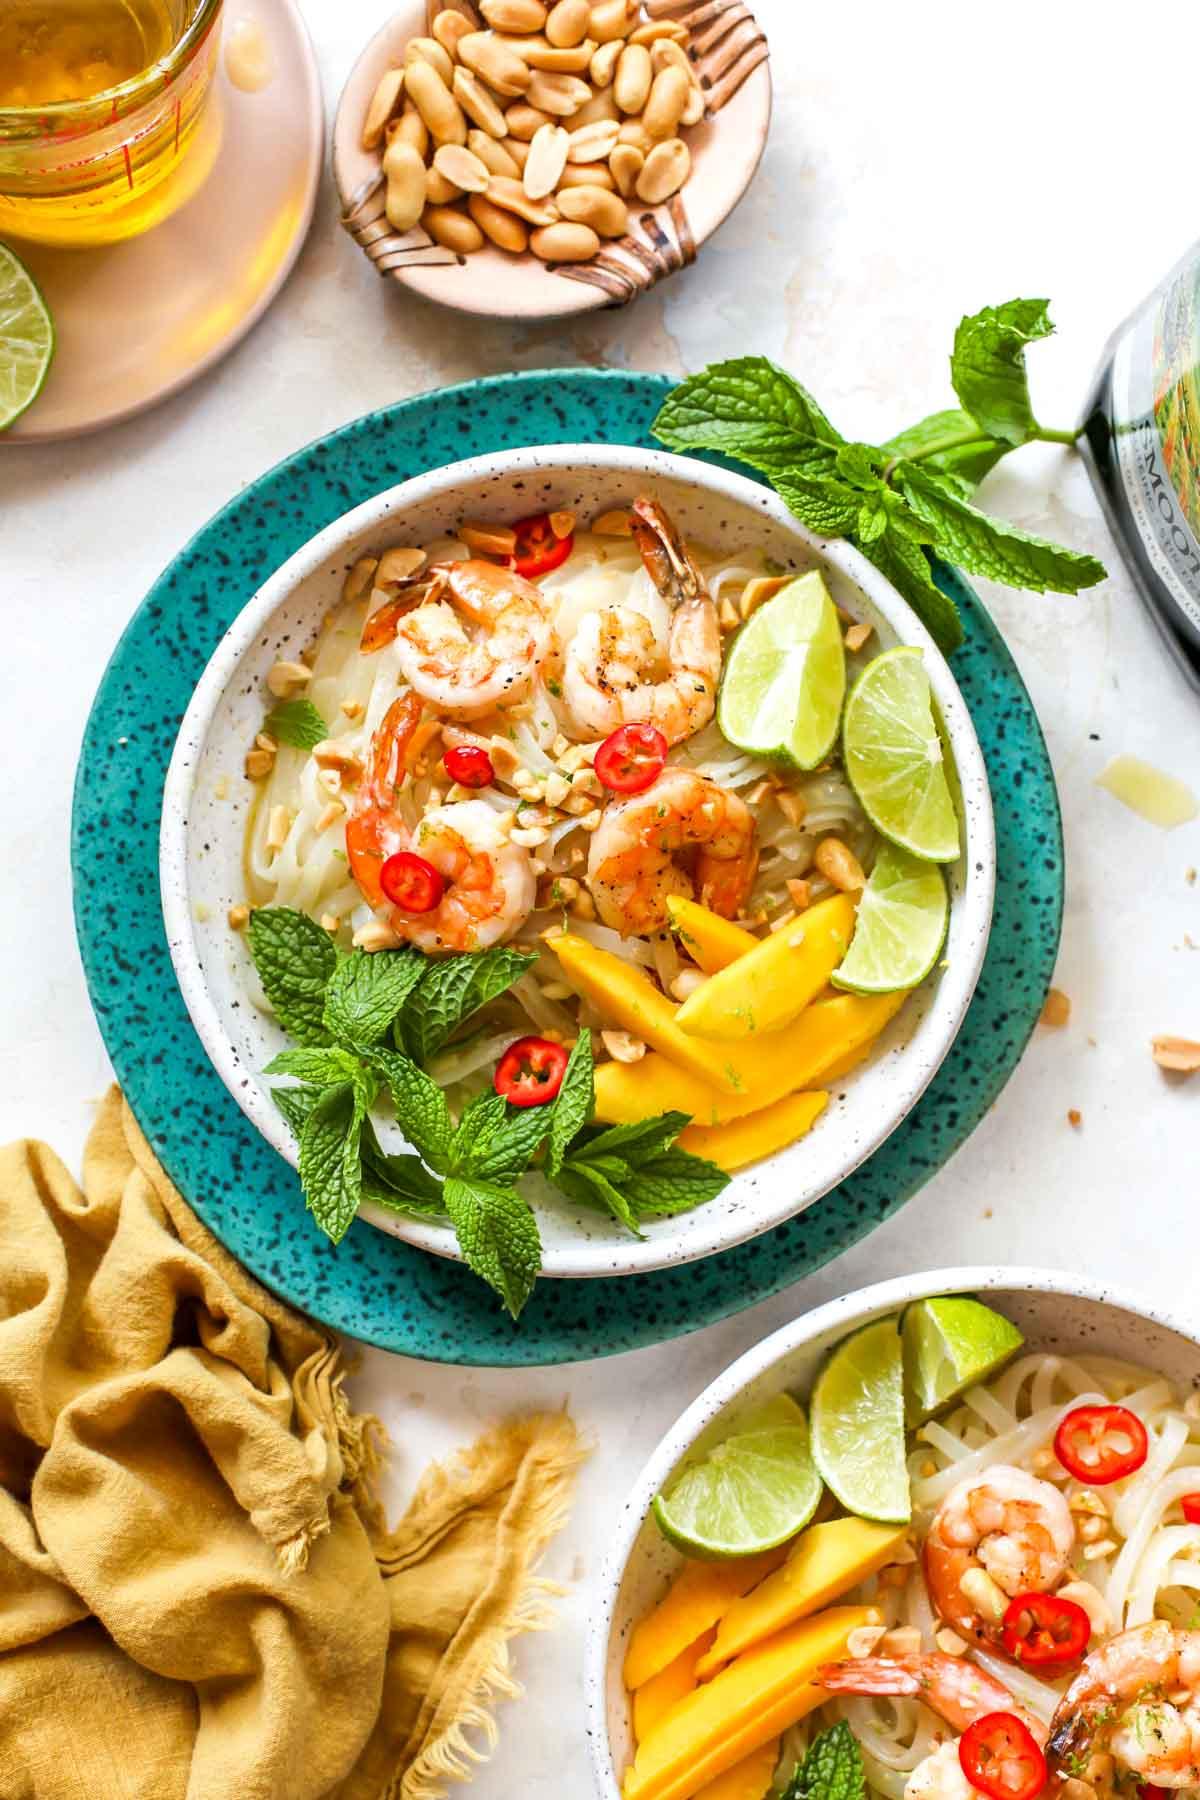 Shrimp noodle salad tossed with ginger dressing in a tan bowl